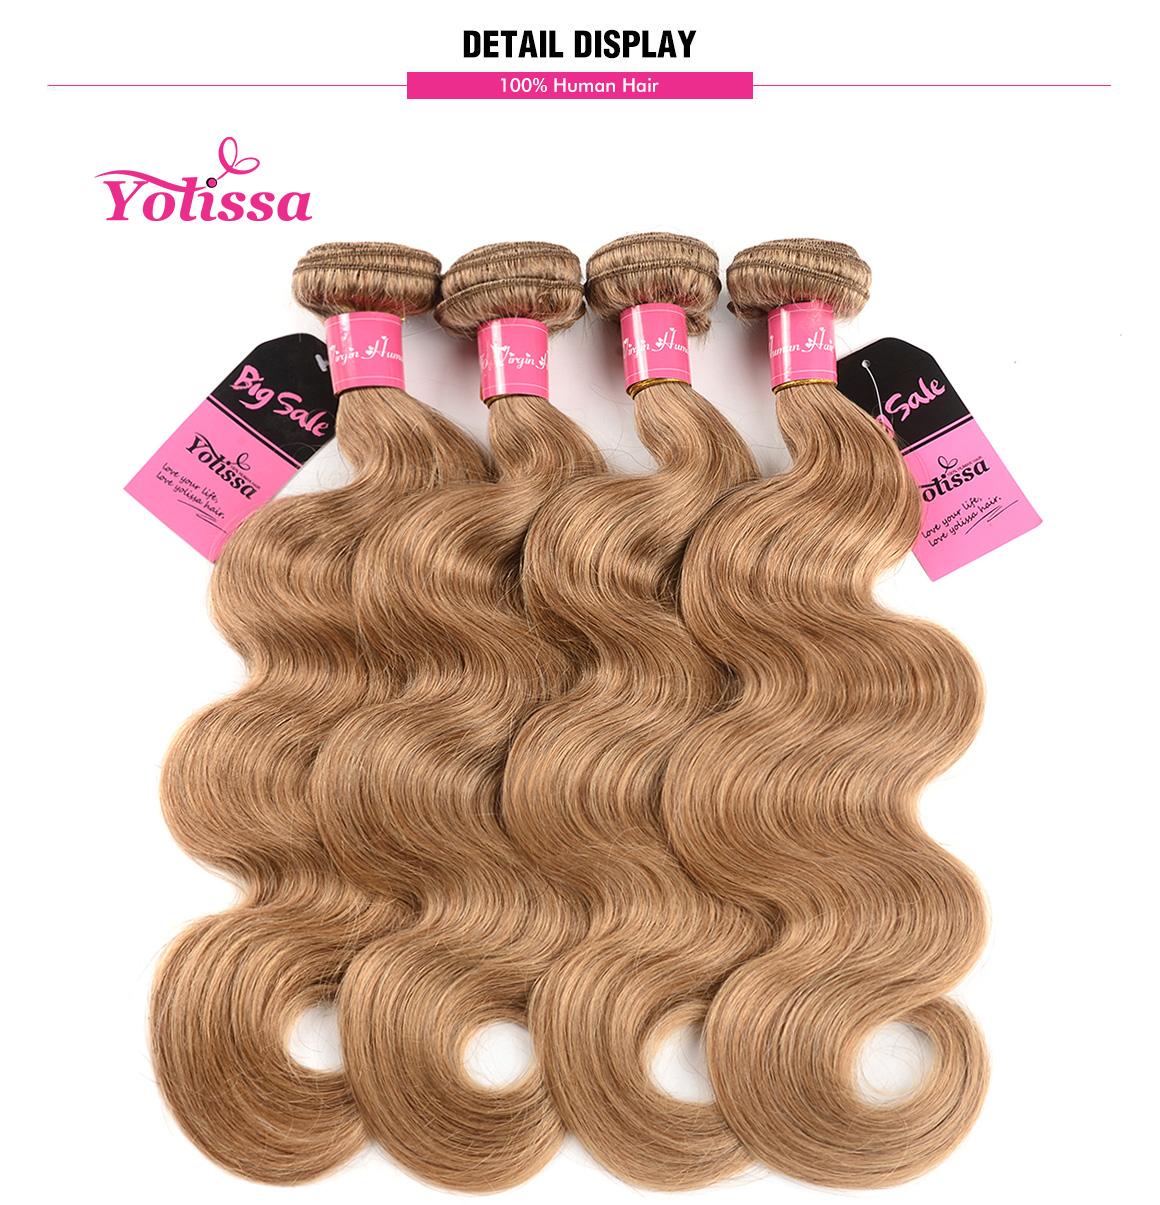 Yolissa 4 Bundles Body Wave Pure Honey Blonde #27 Hair Weaves